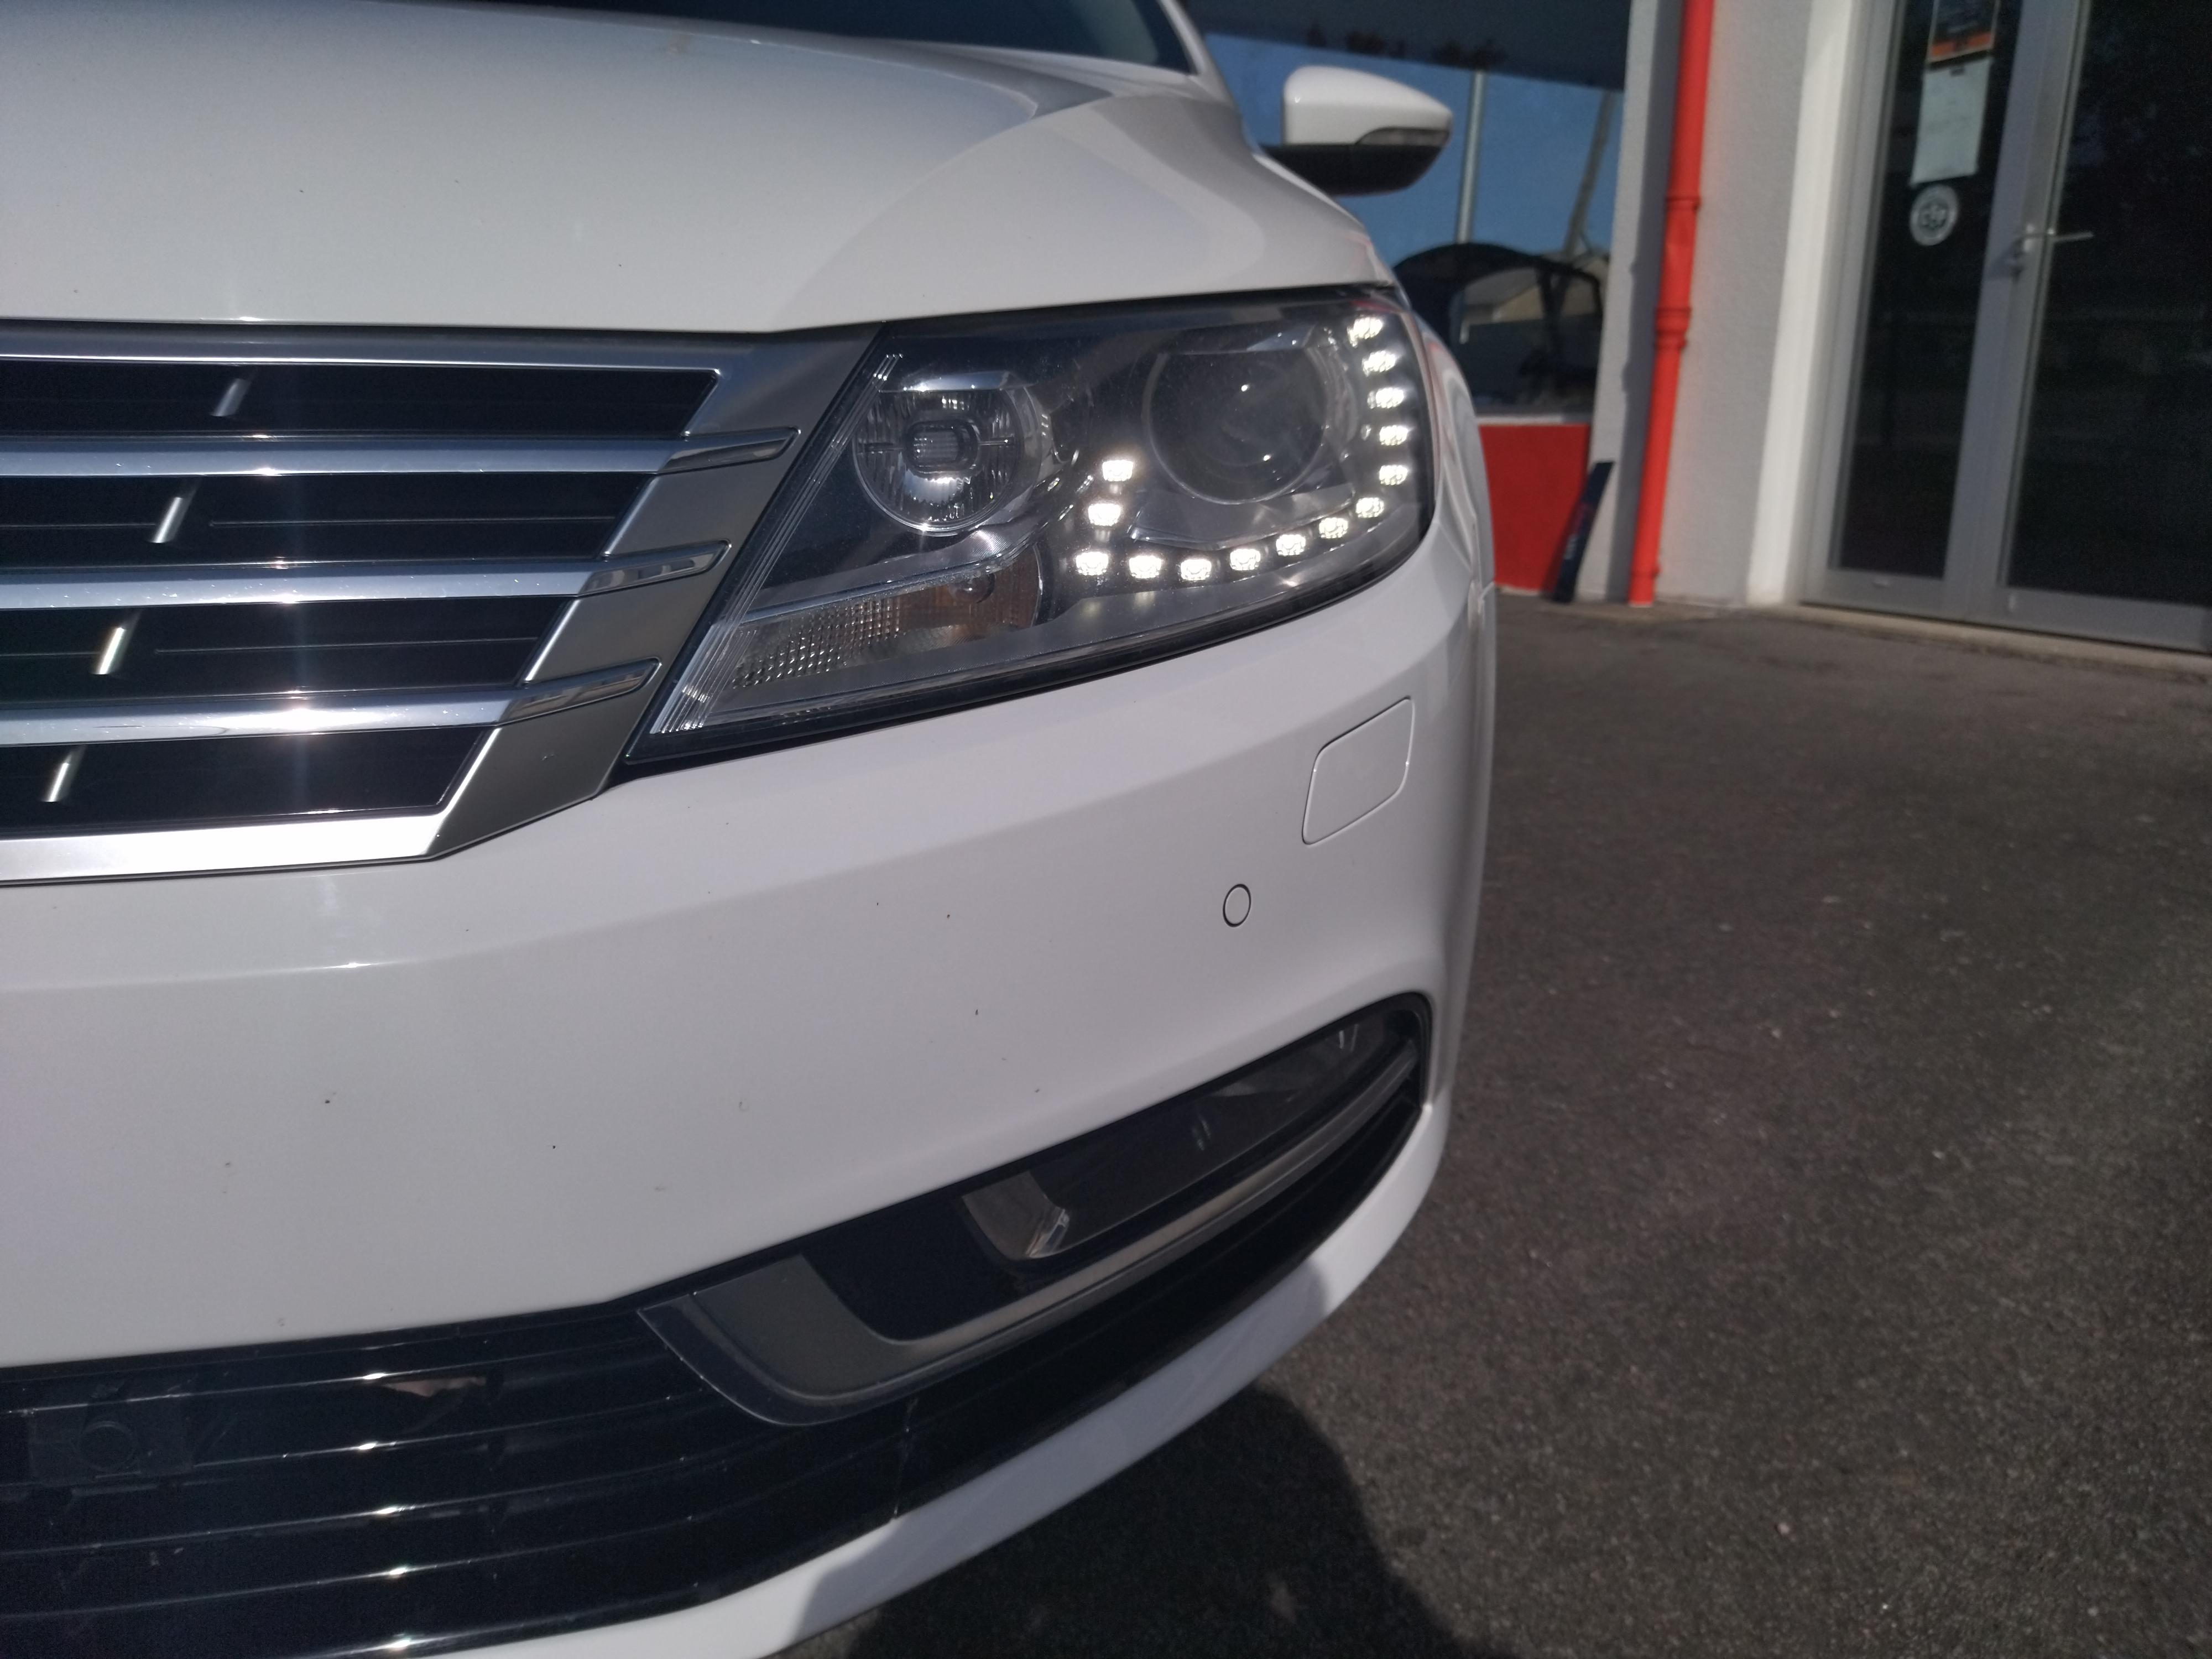 photo_Volkswagen Passat cc 2.0 TDI 140 CH CARAT BLUEMOTION GARANTIE 6 MOIS , Carslift